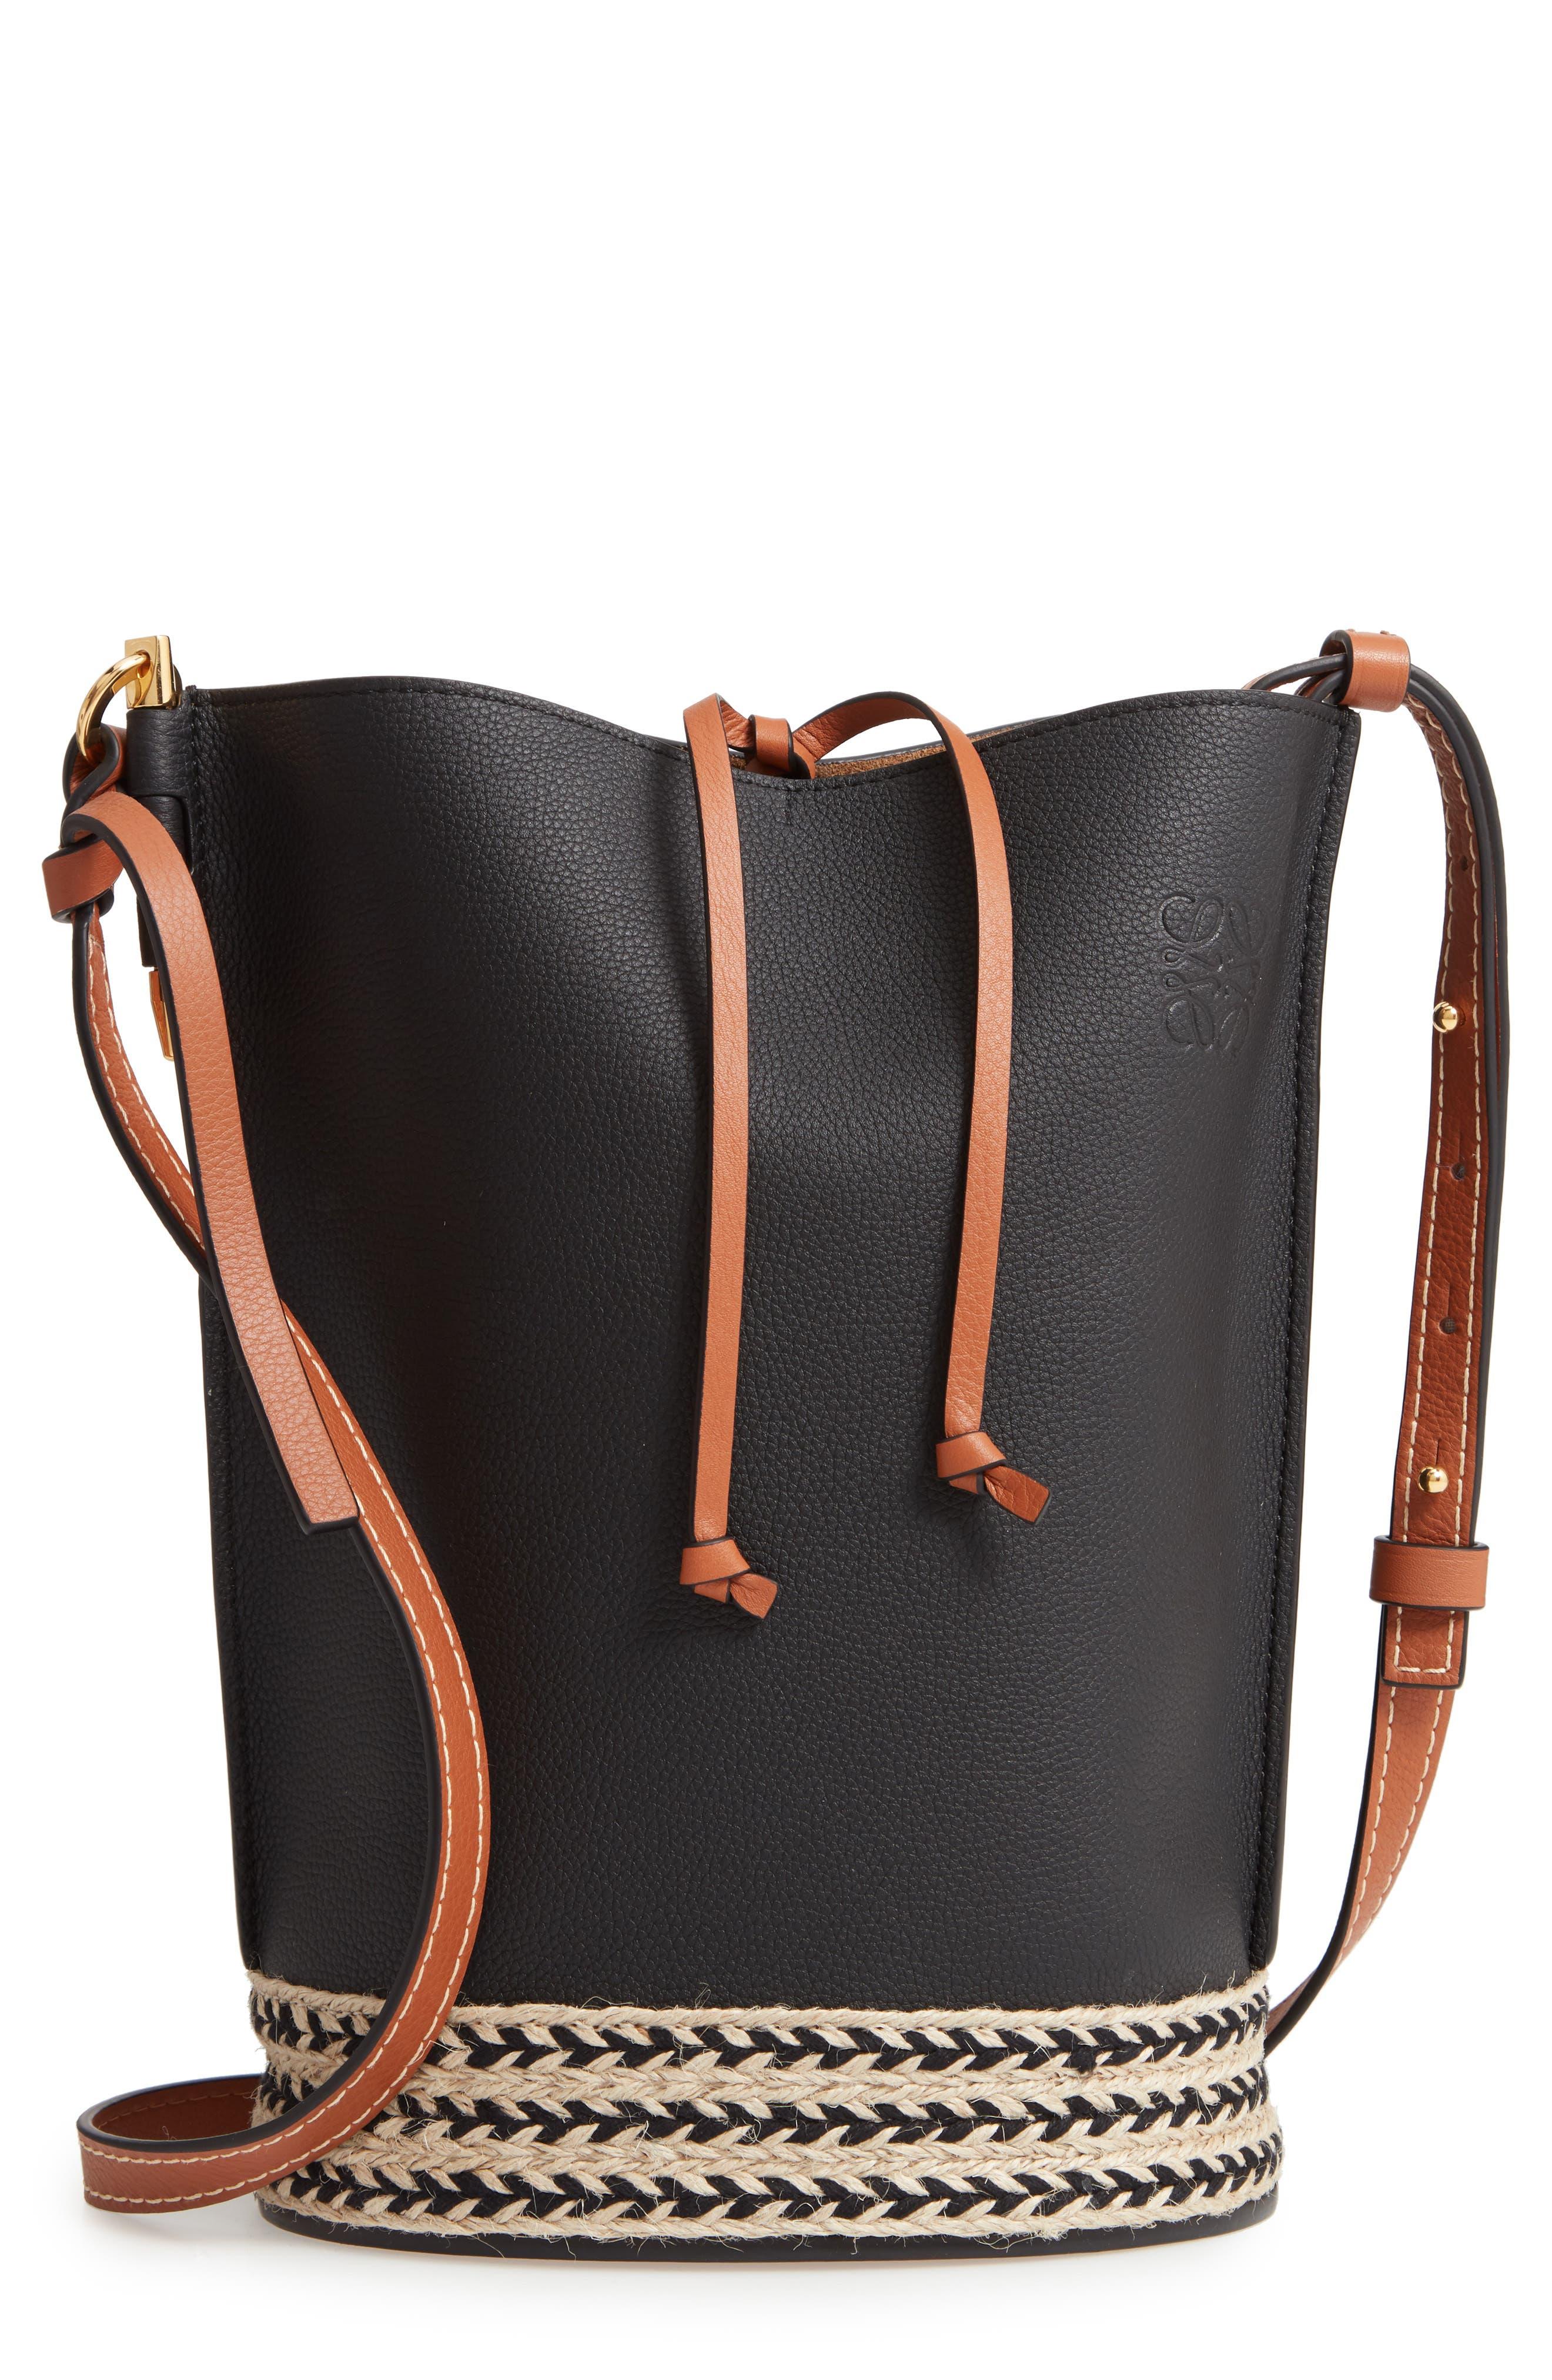 LOEWE Gate Espadrillas Leather Bucket Bag, Main, color, BLACK